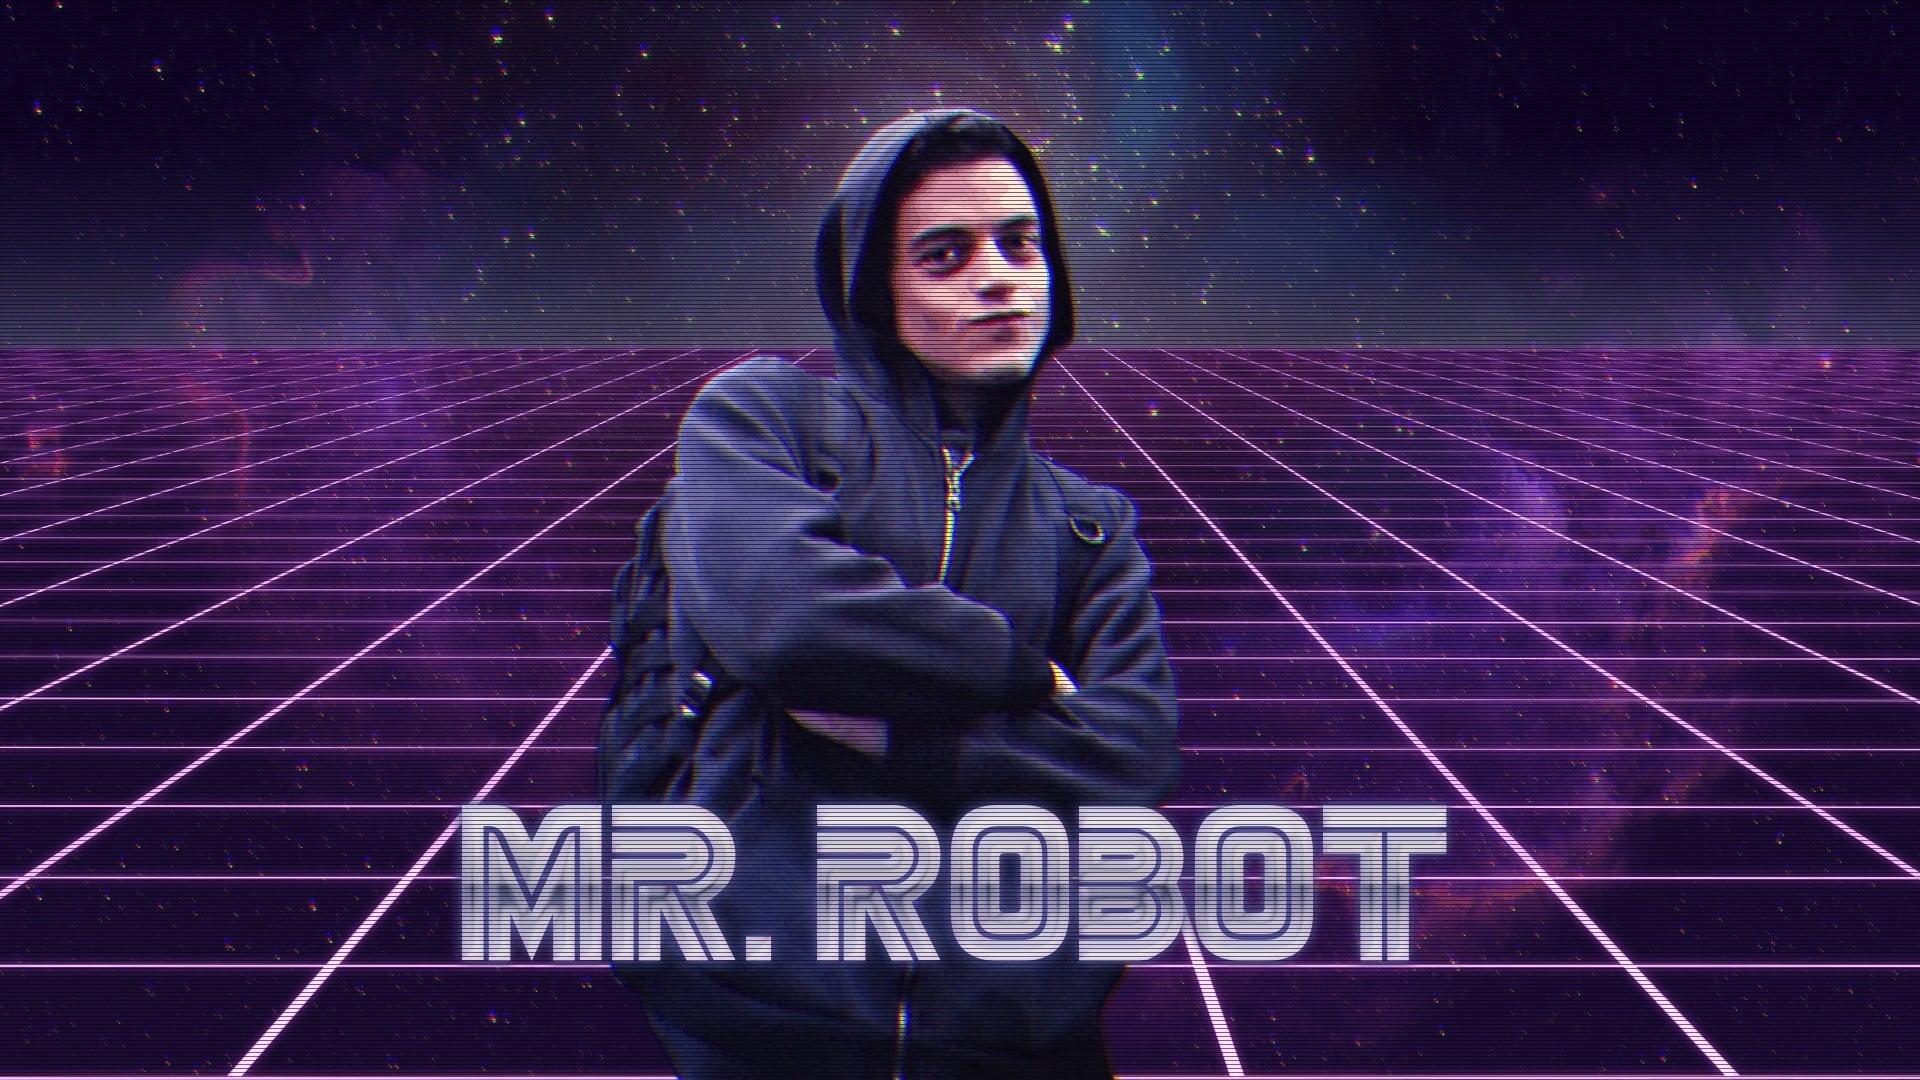 Mr. Robot